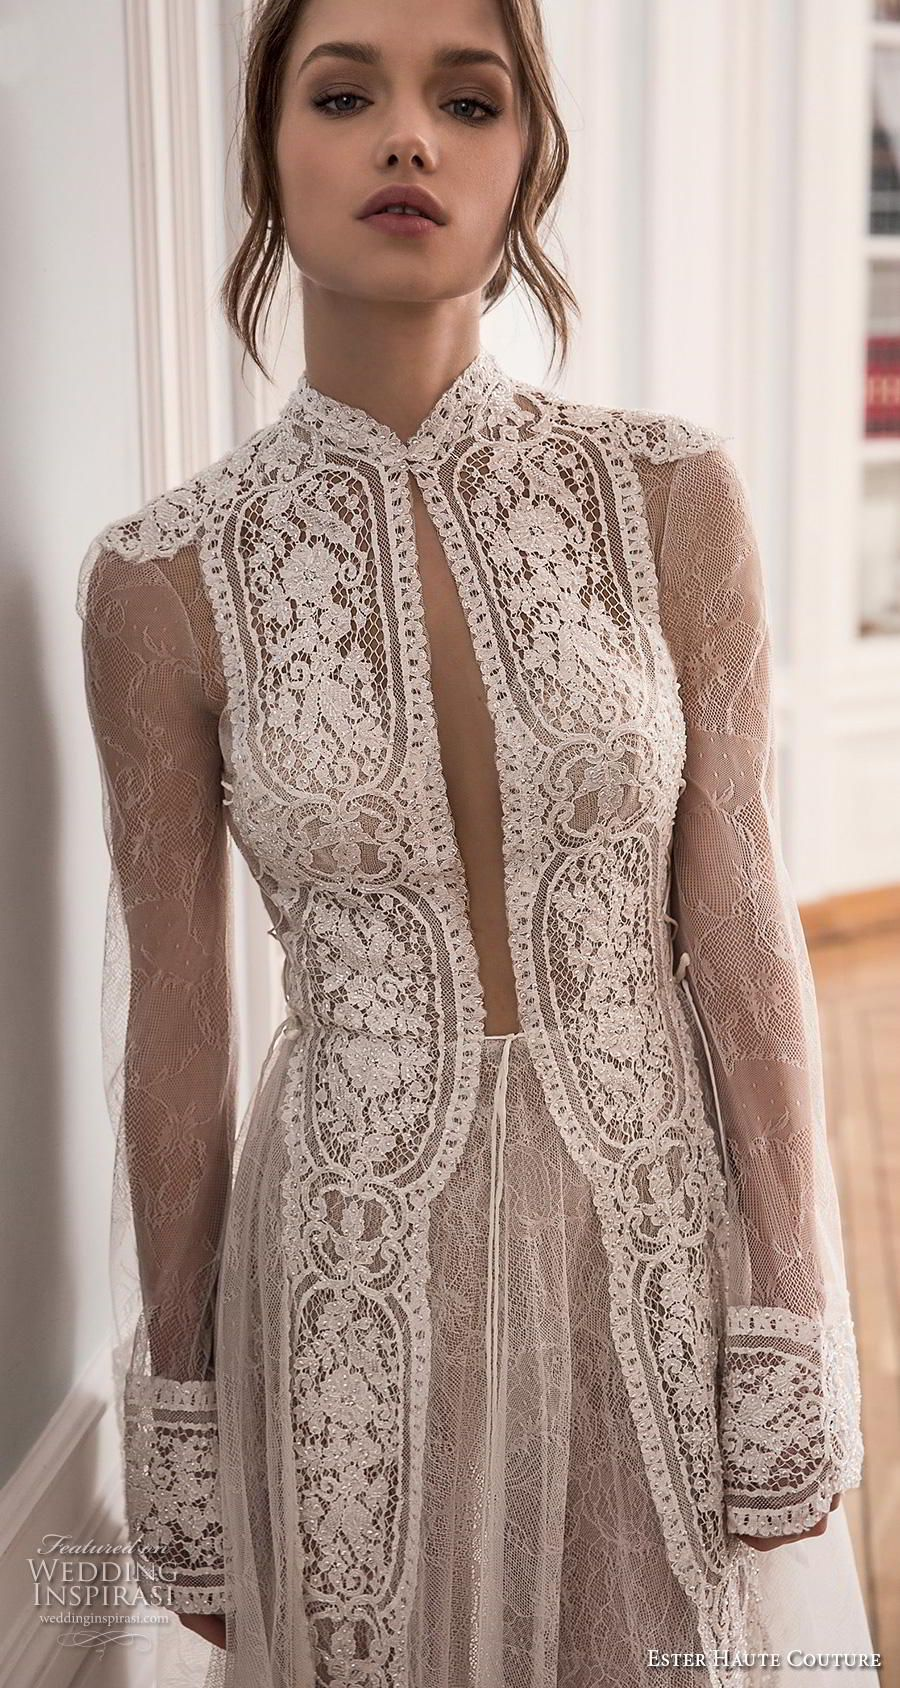 Ester Haute Couture 2018 2019 Wedding Dresses Wedding Inspirasi Couture Dresses Elegant Dresses High Neck Wedding Dress